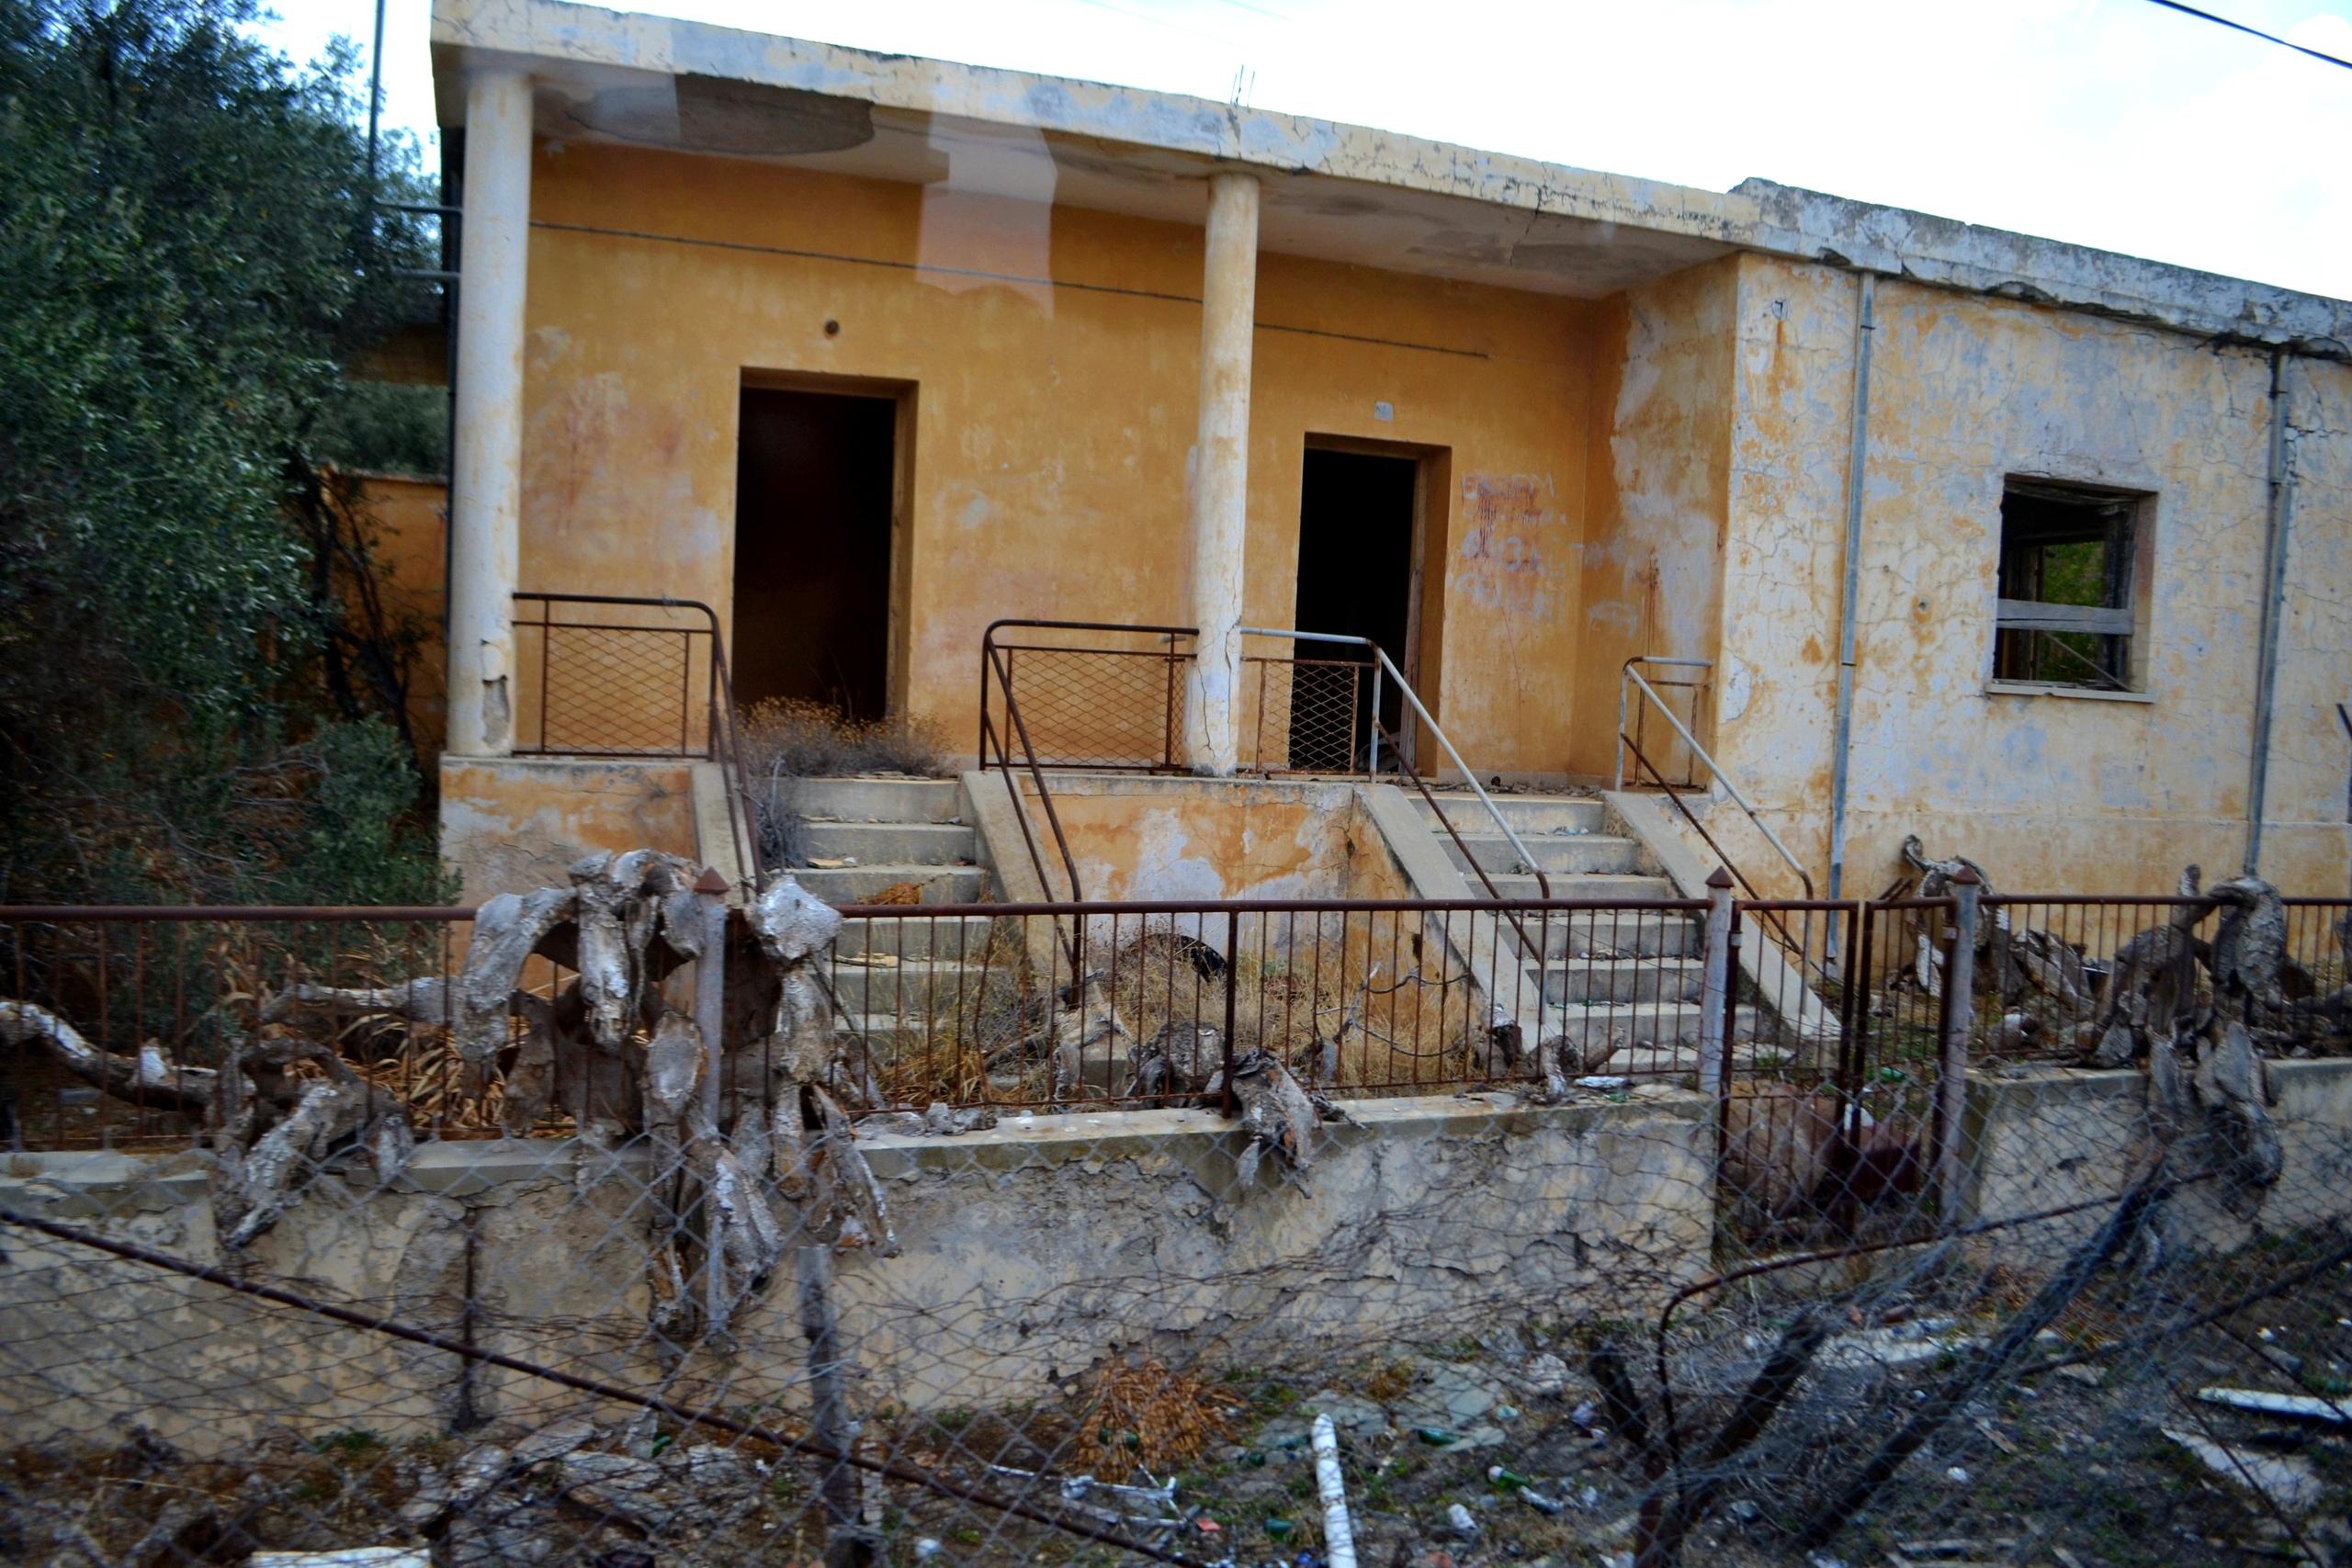 Елена Руденко (Валтея). Северный Кипр. Кериния и Фамагуста. (фото) - Страница 3 HR7tkK_Jq9A